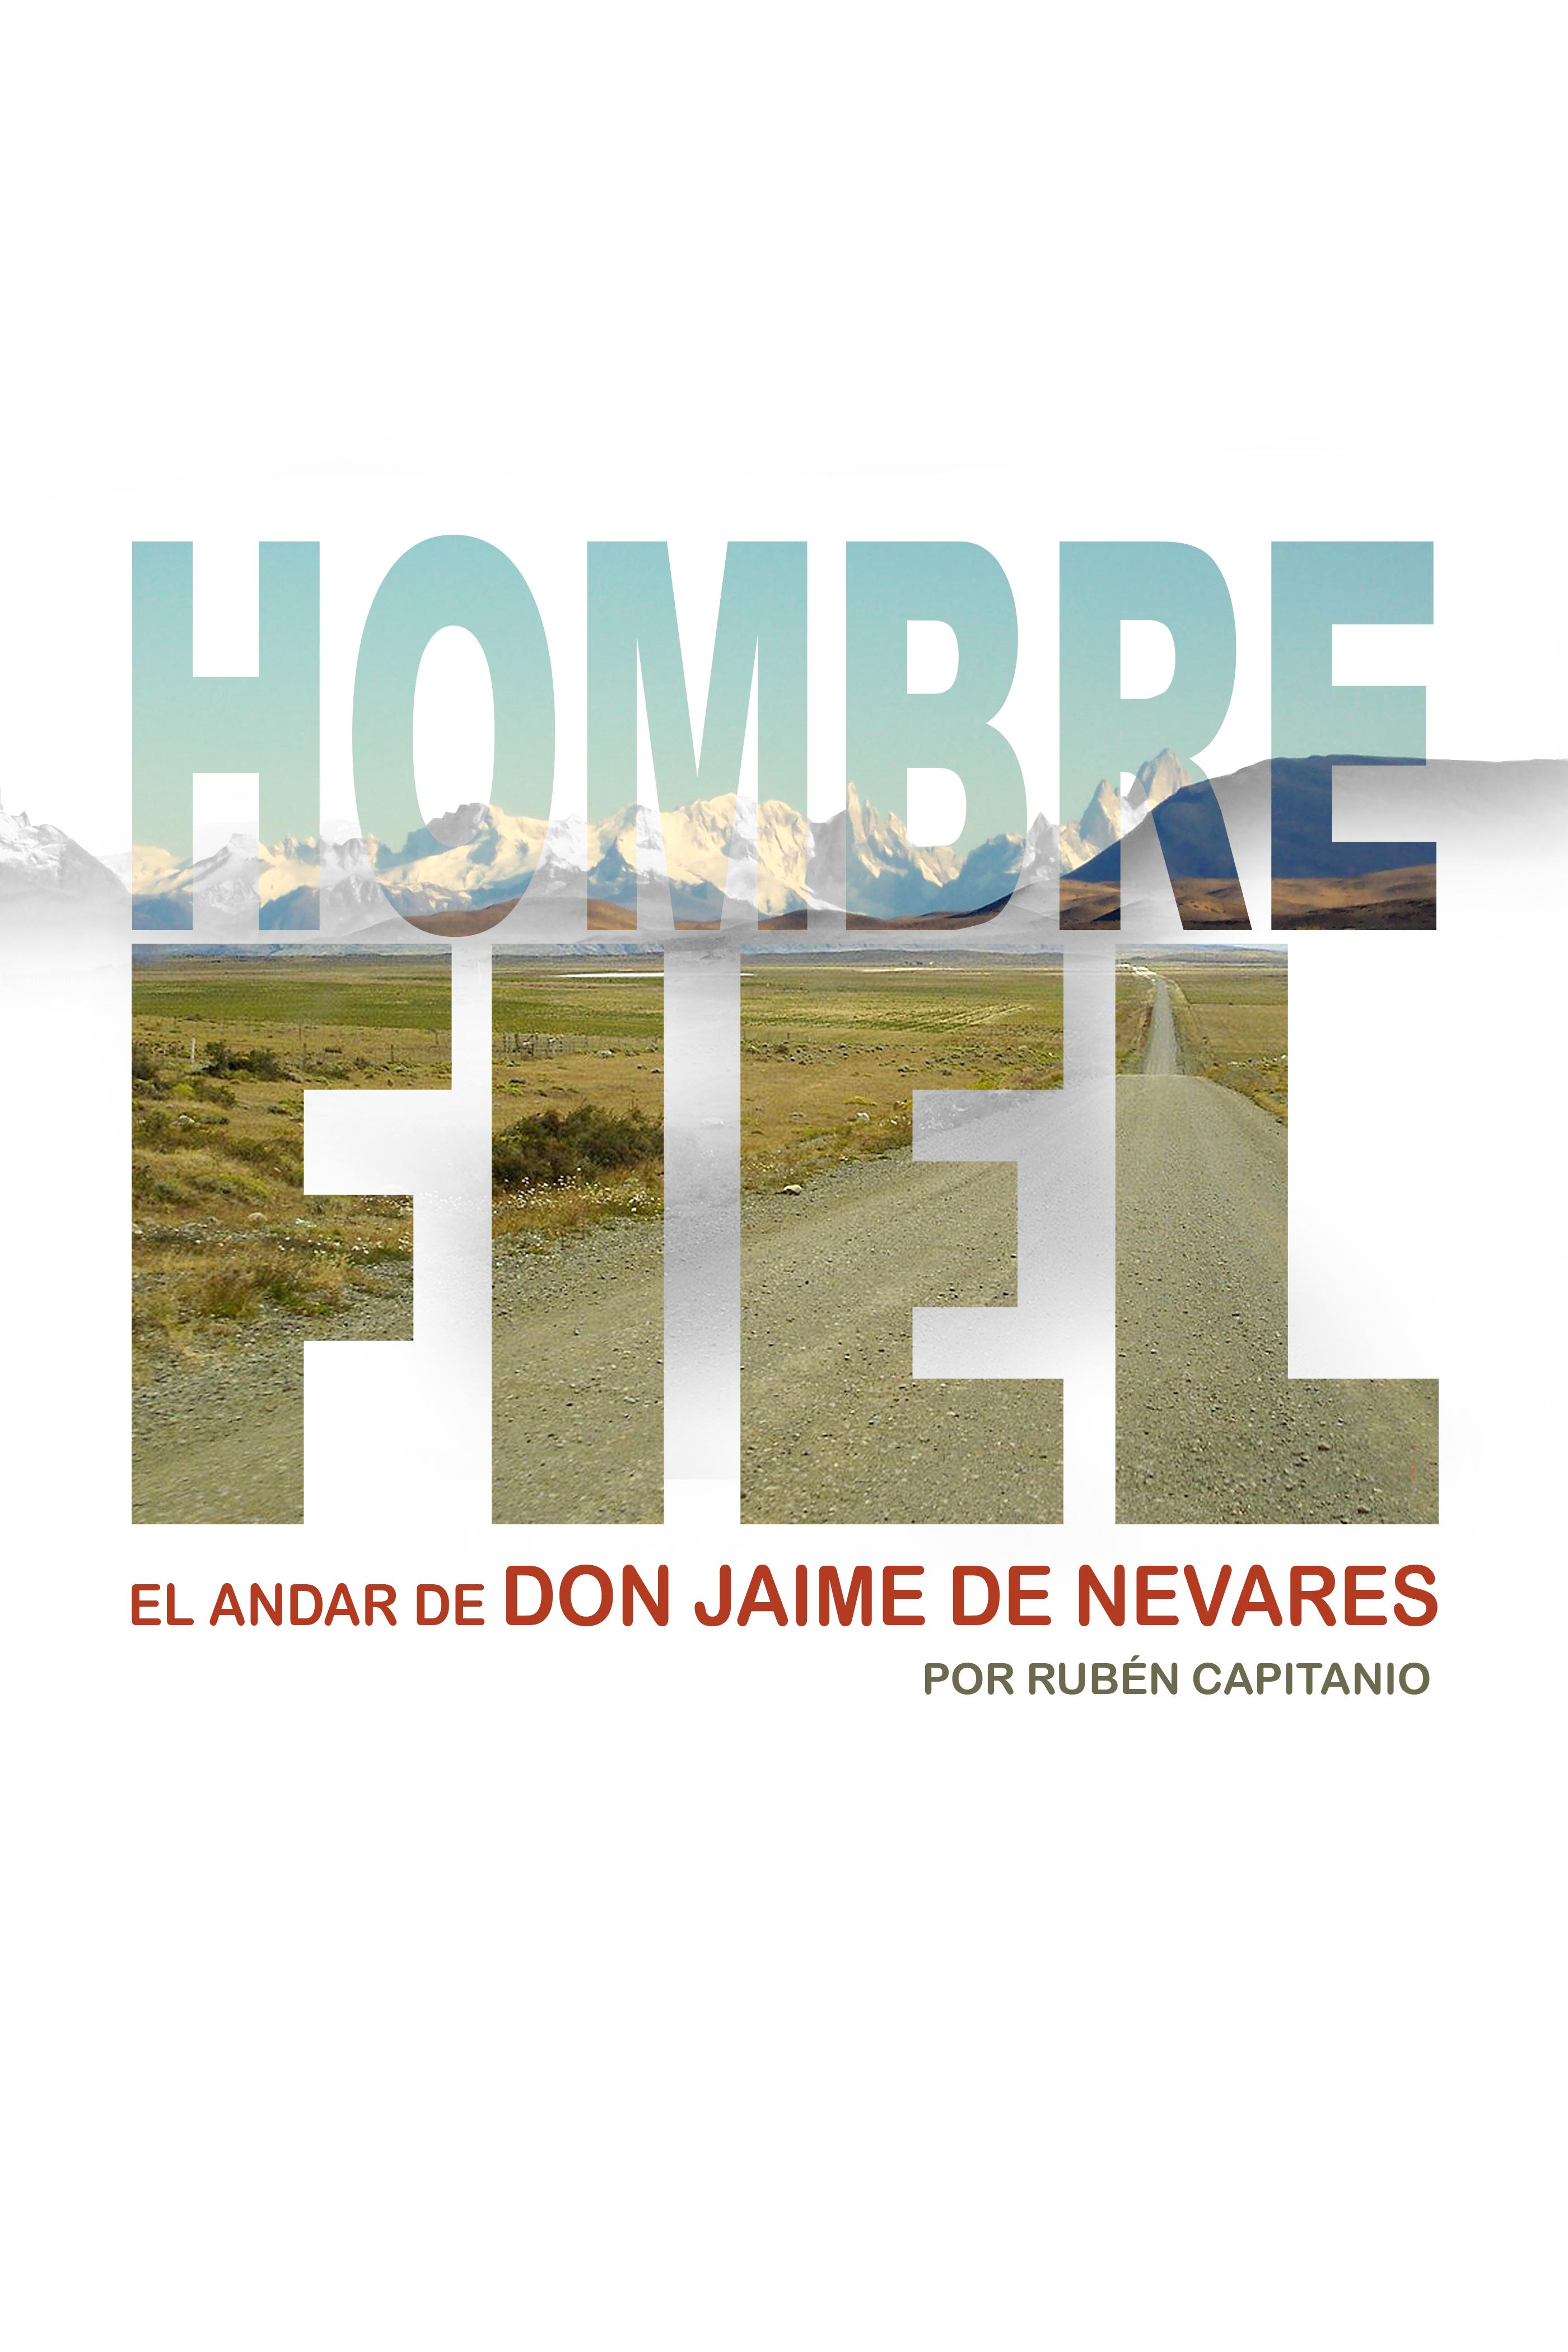 Libro: Hombre Fiel. El andar de Don Jaime de Nevares